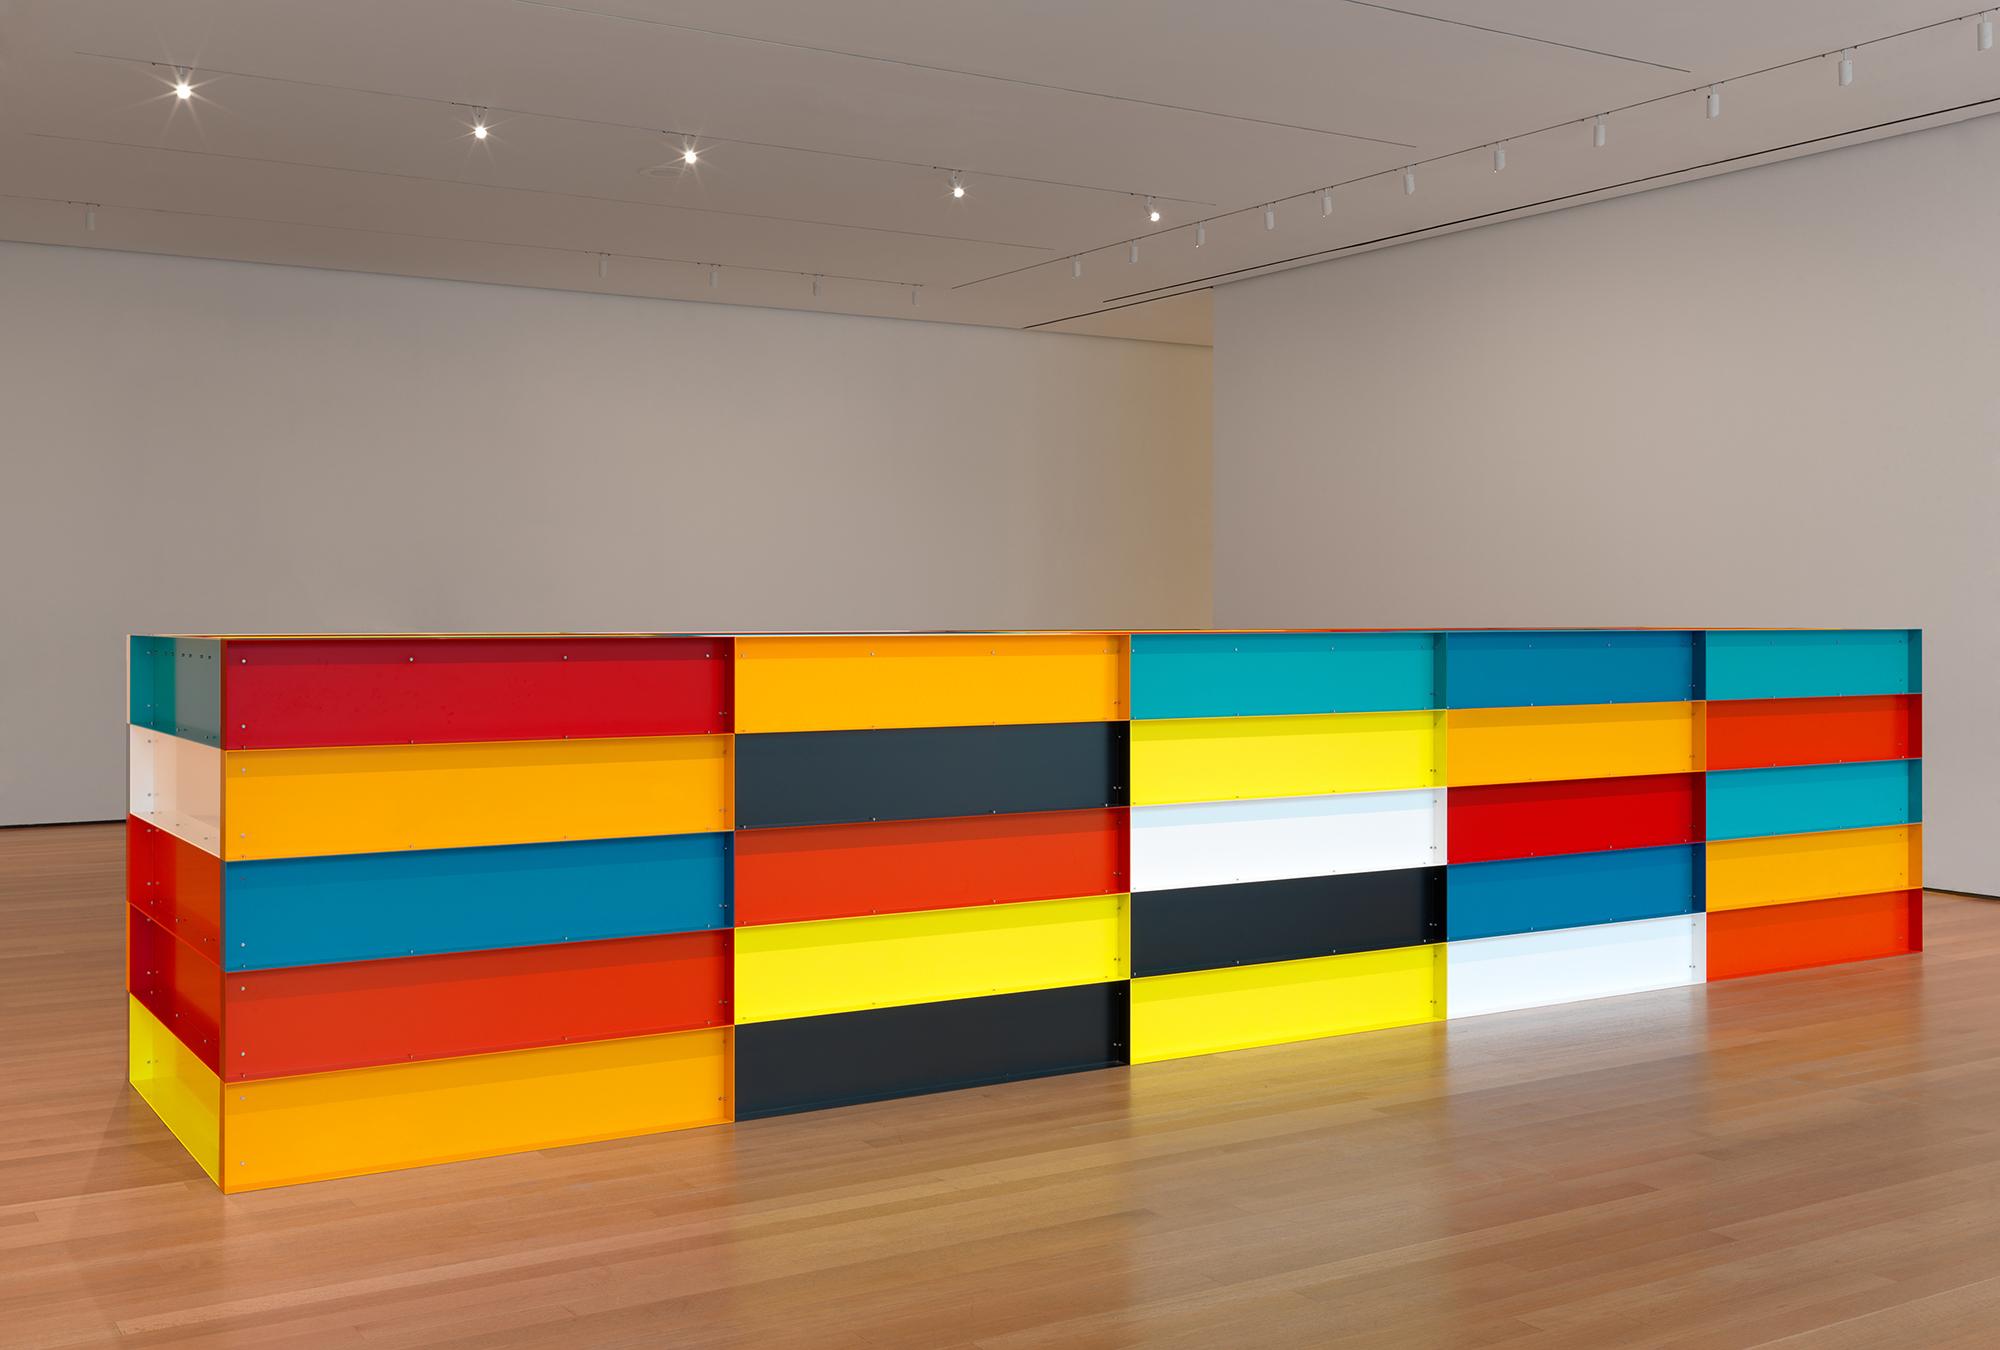 MoMA's Long-Awaited Donald Judd Retrospective Set for March 2020